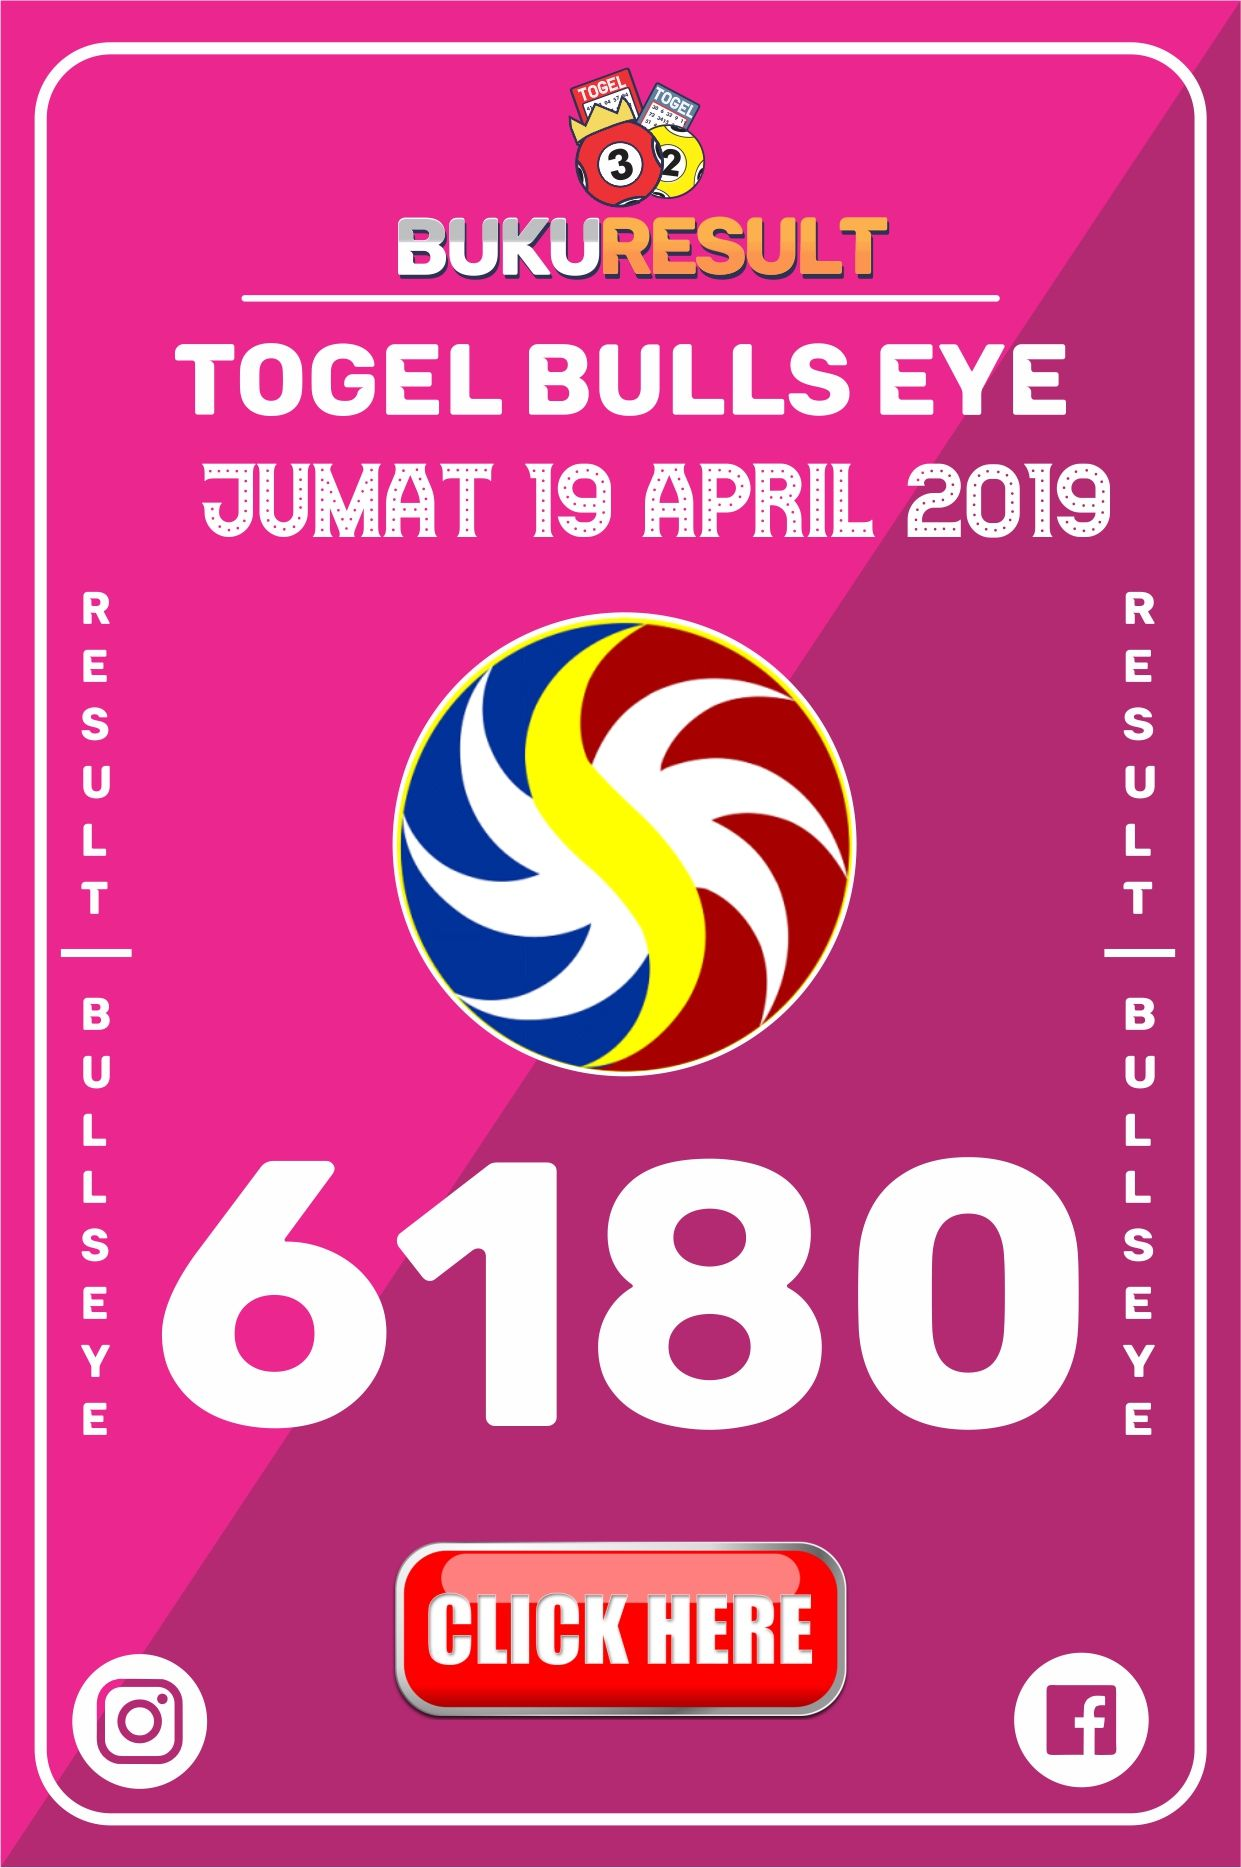 Live result bullseye pools,keluaran angka togel bullseye